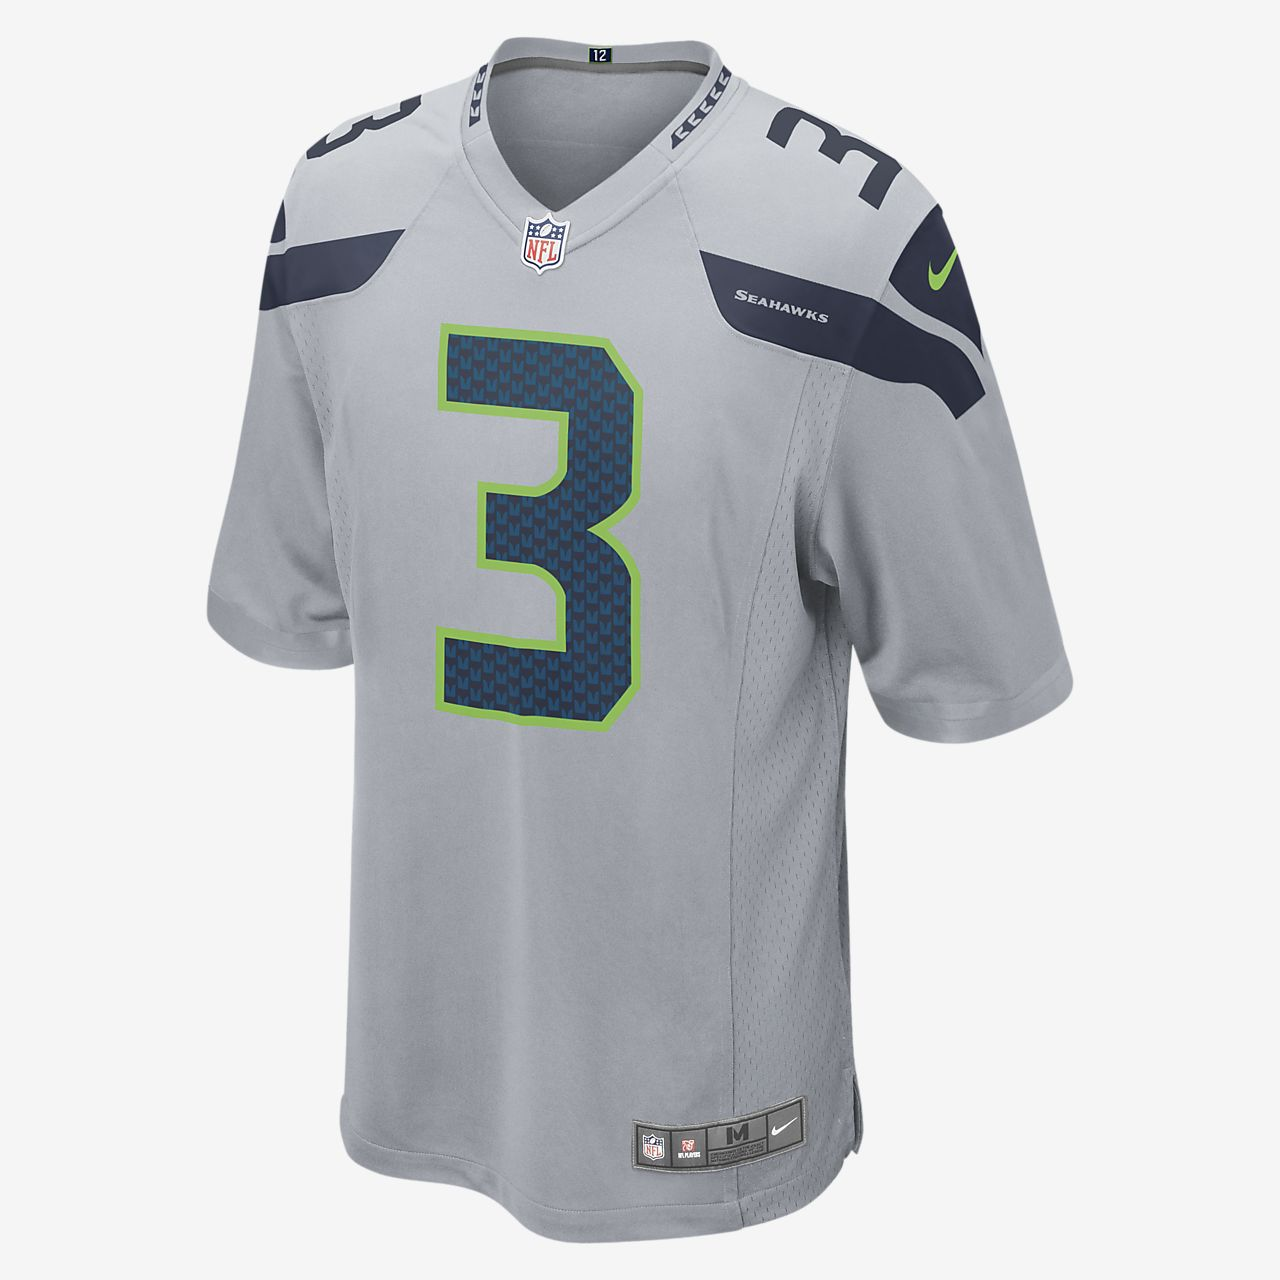 Мужское игровое джерси для американского футбола NFL Seattle Seahawks (Russell Wilson)